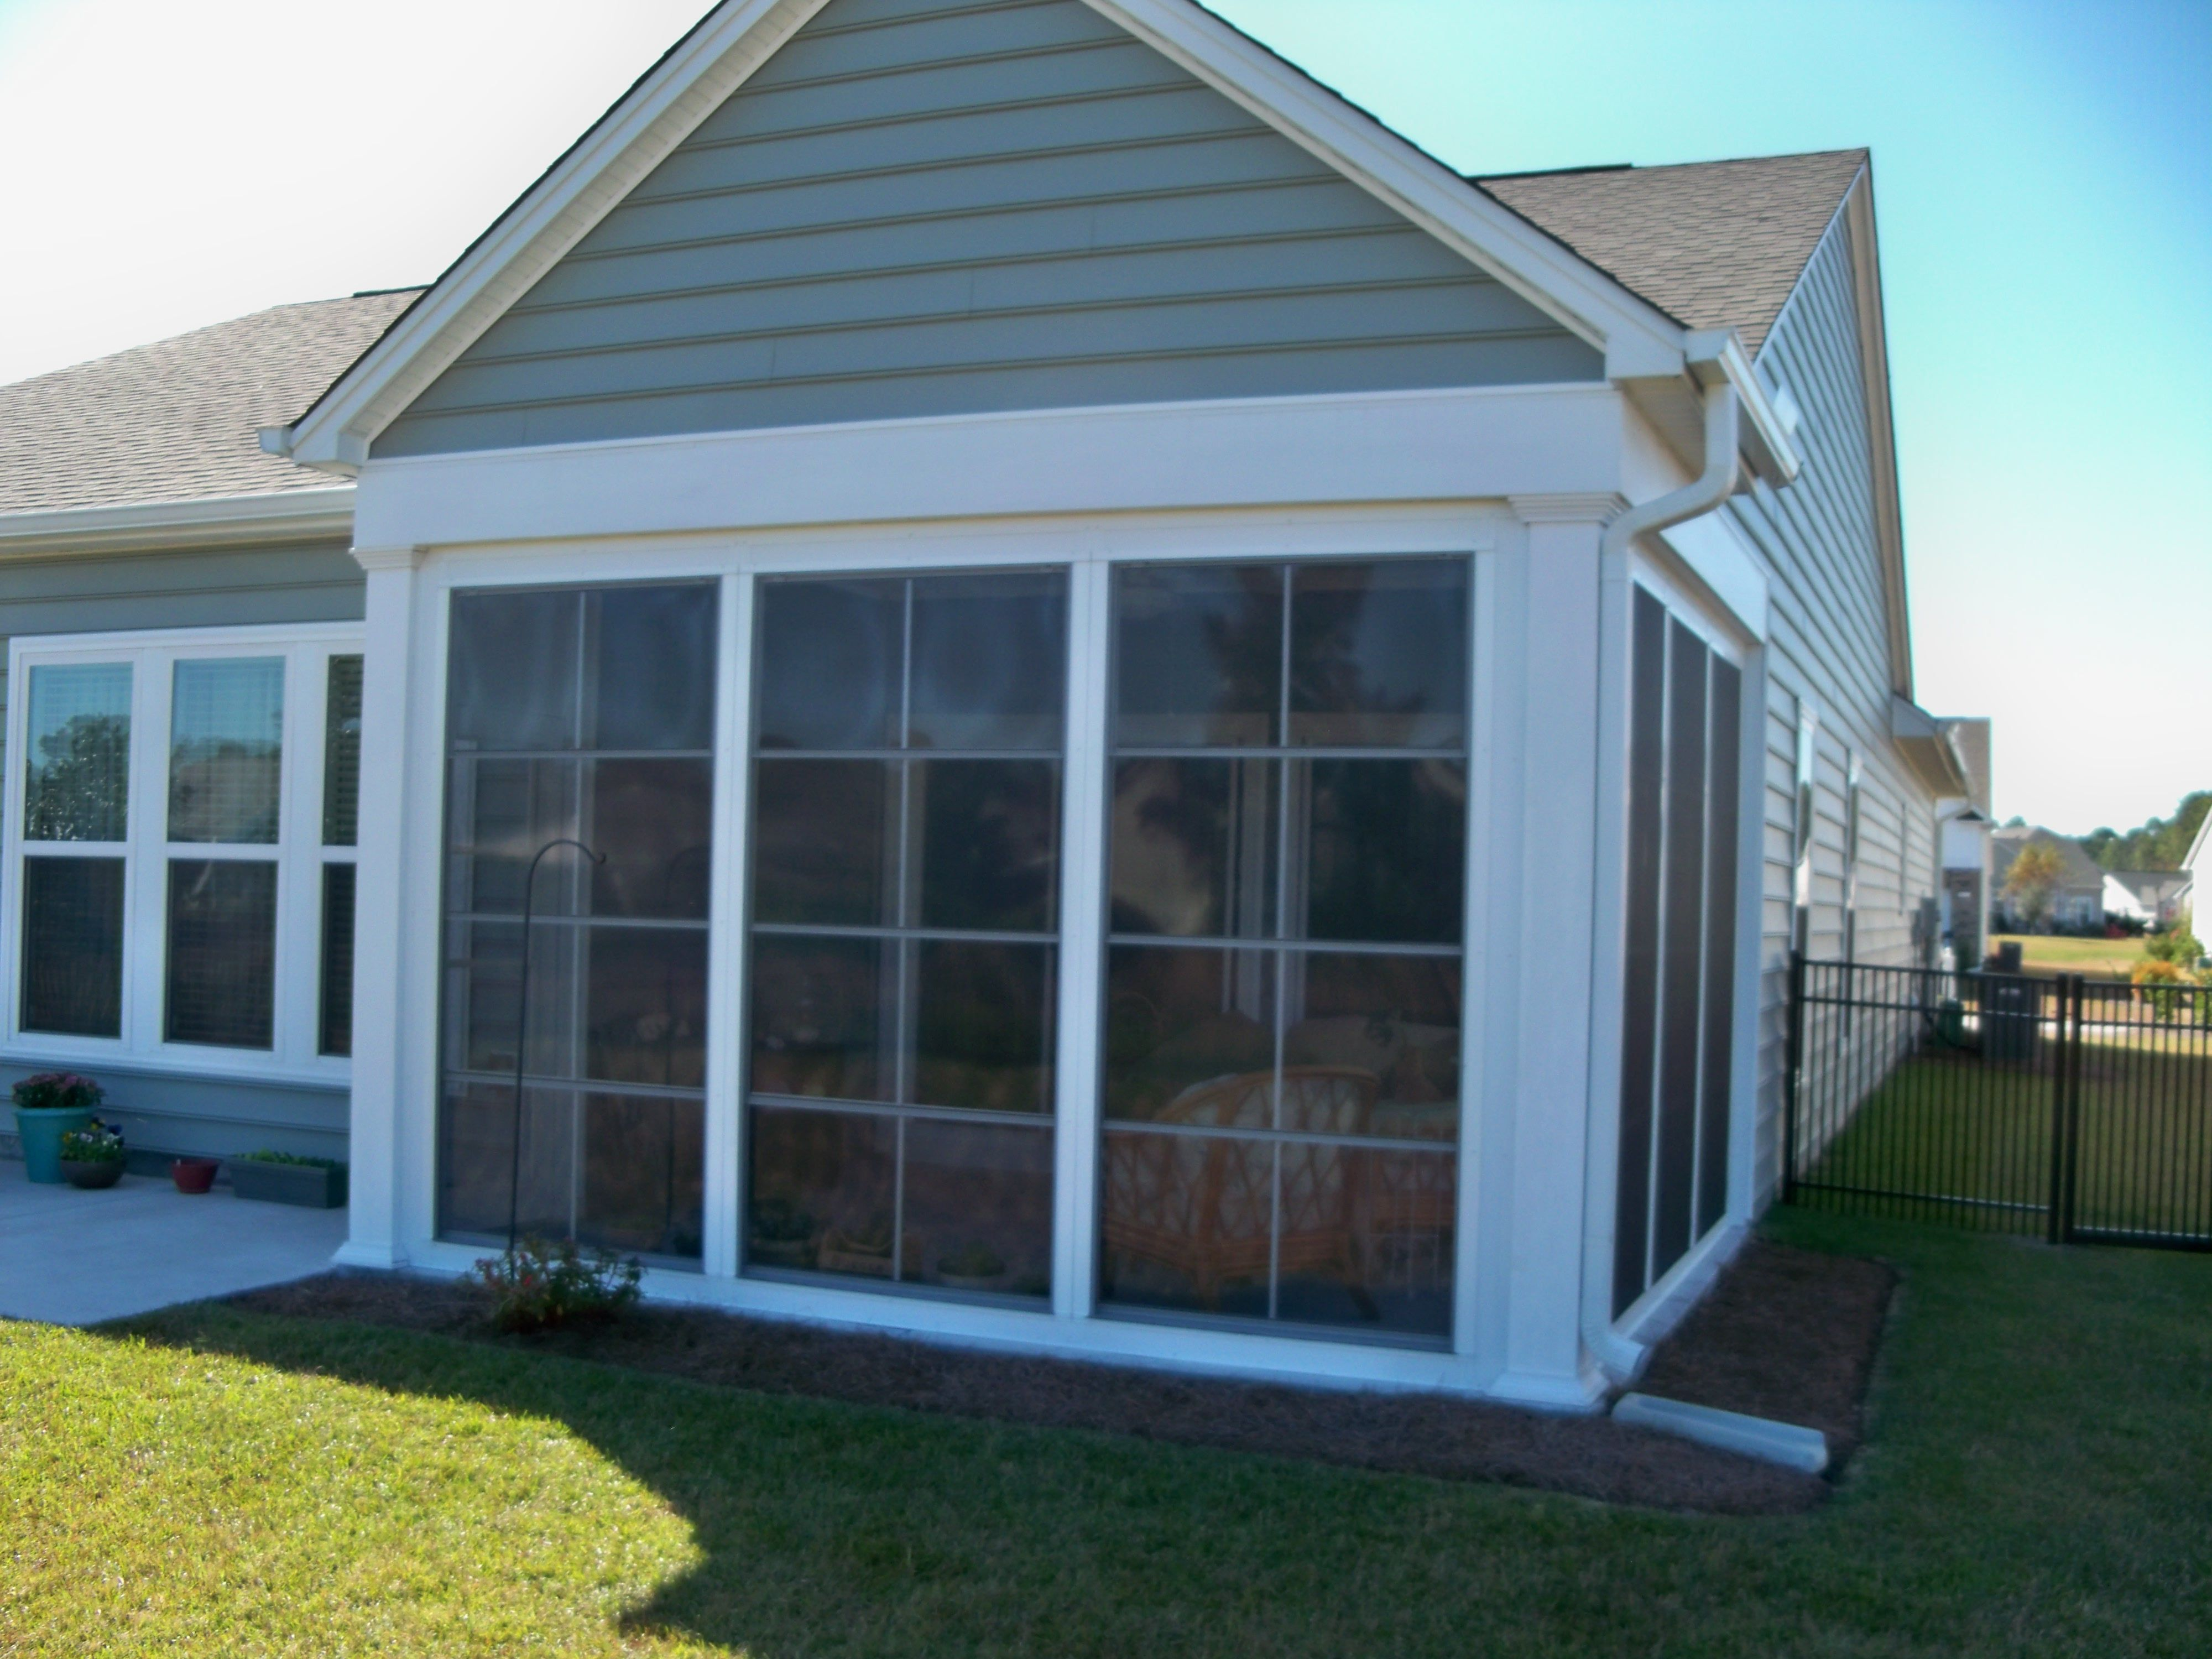 Captivating Enclosed Porches And Sunrooms | The Sunroom Store   Wilmington U0026 Greenville  NC | Sunrooms U0026